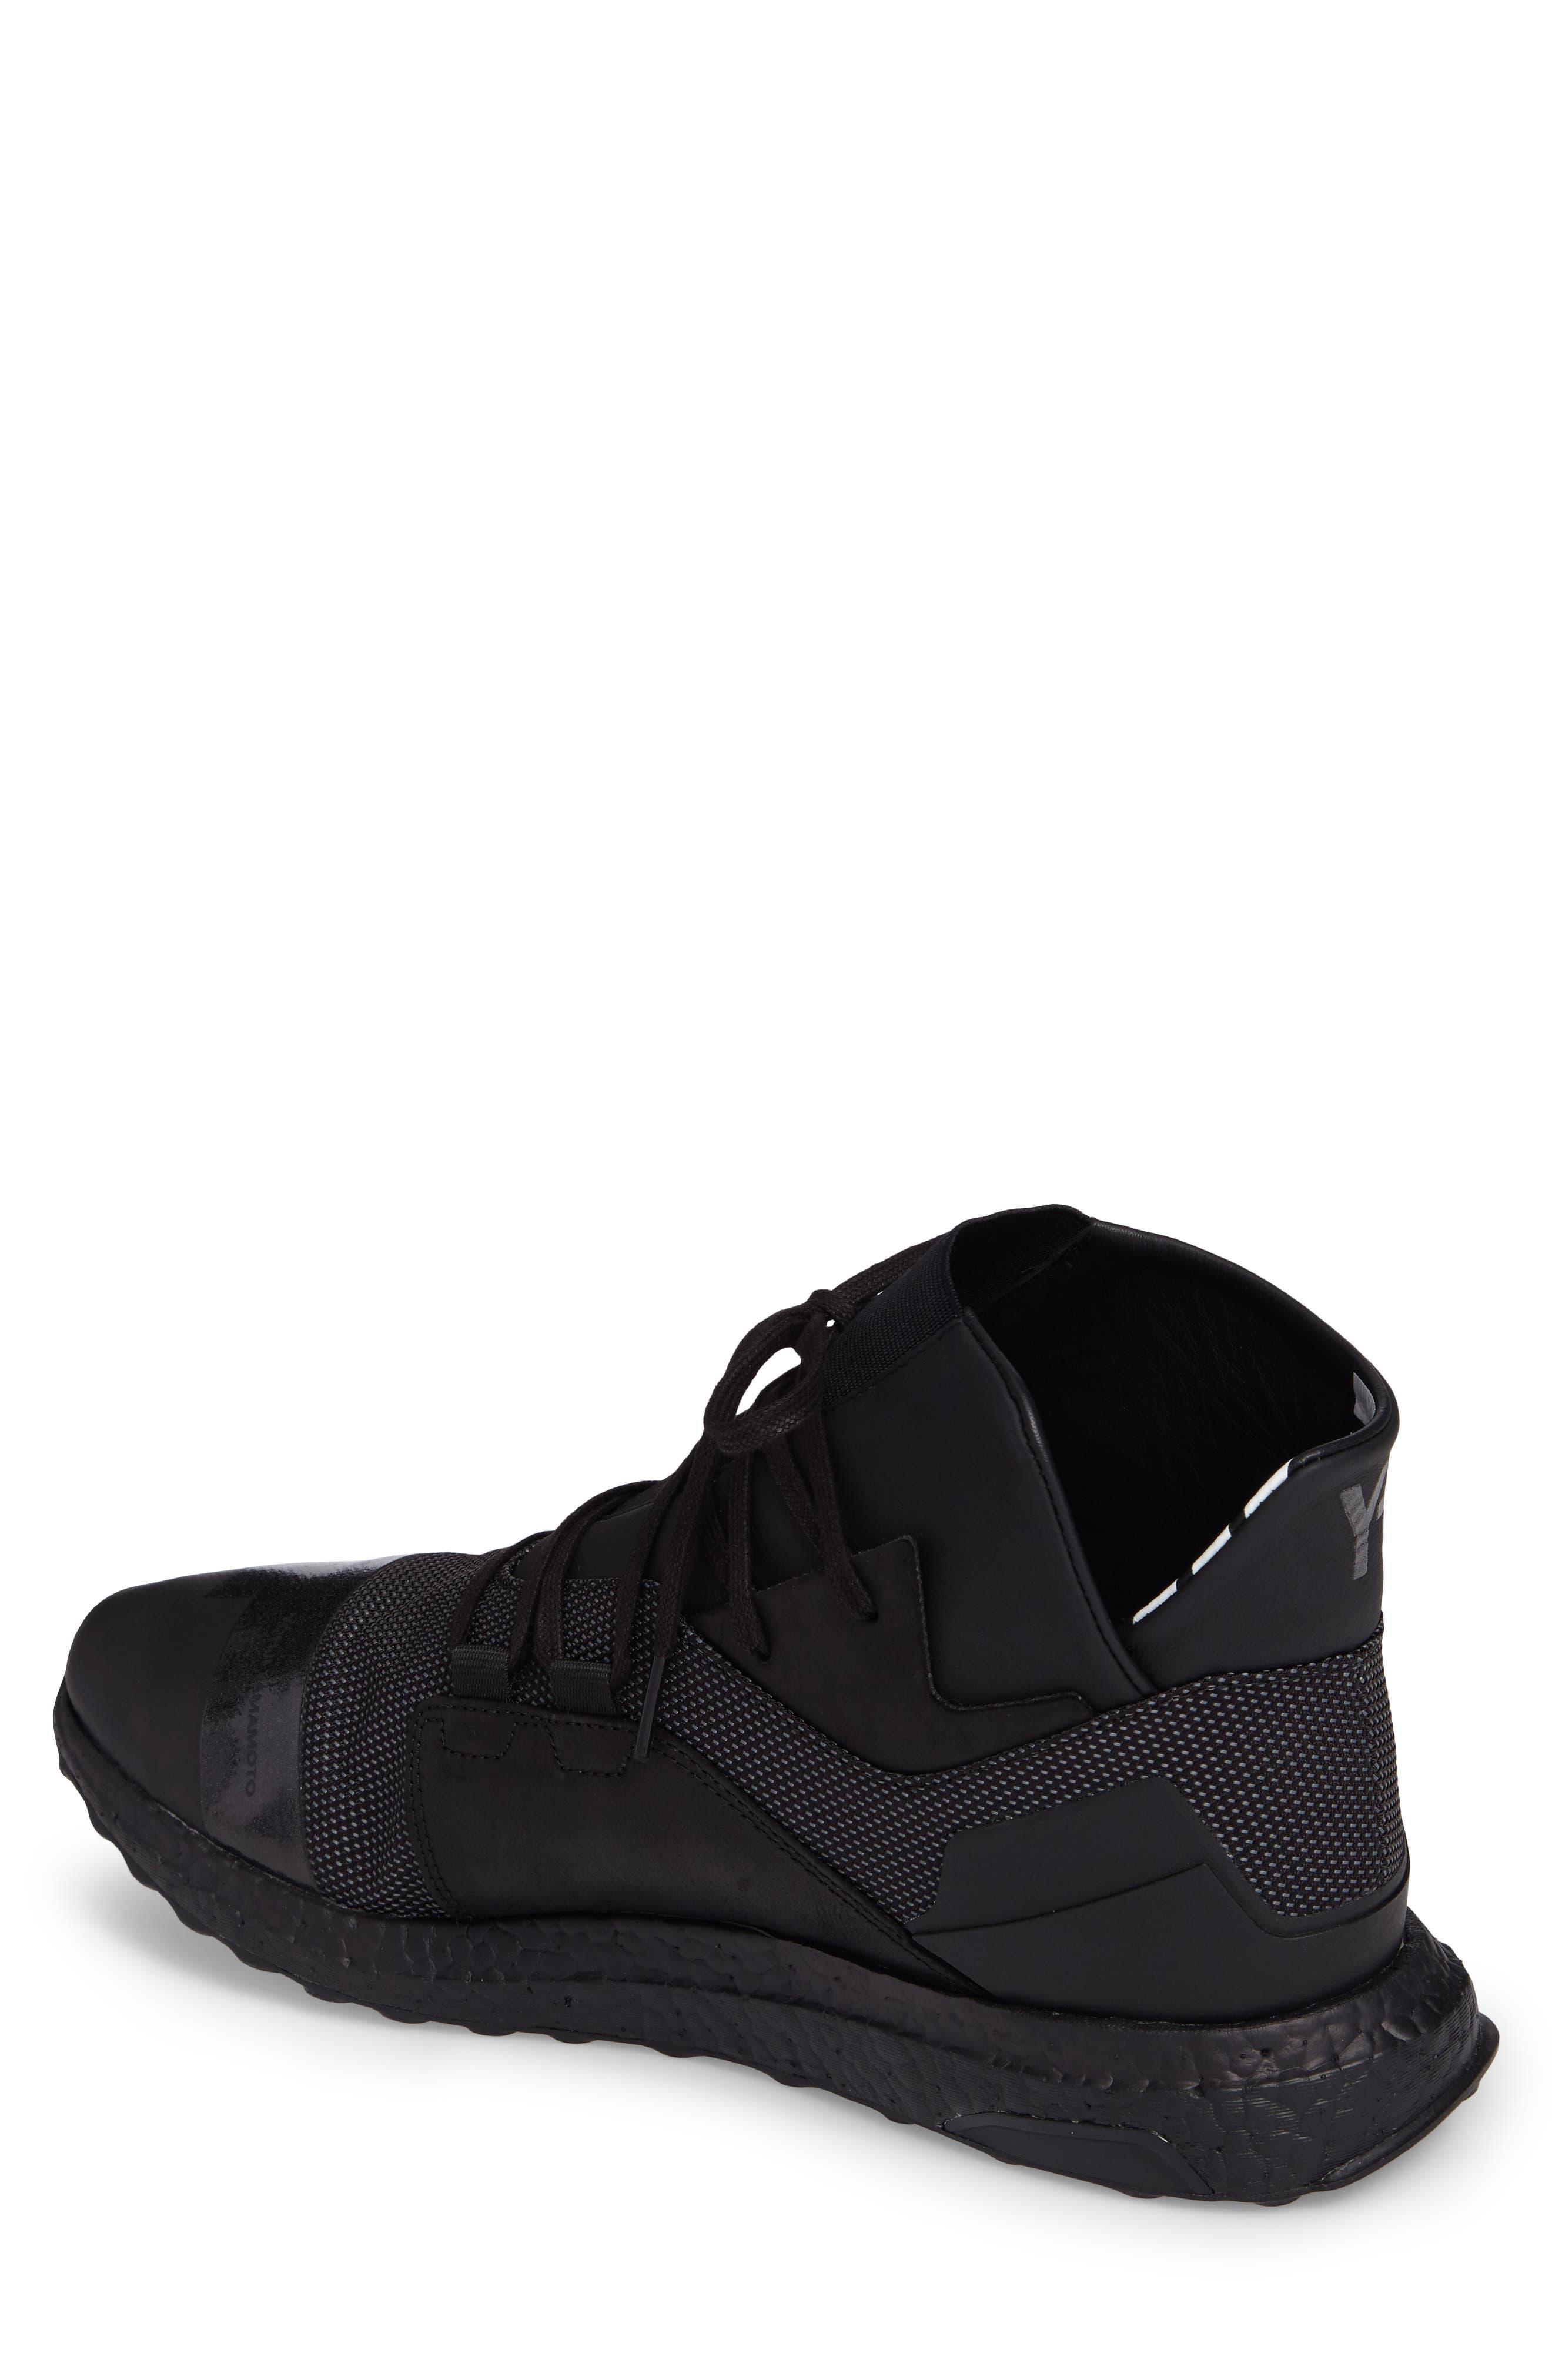 Kozoko High Sneaker,                             Alternate thumbnail 2, color,                             Black